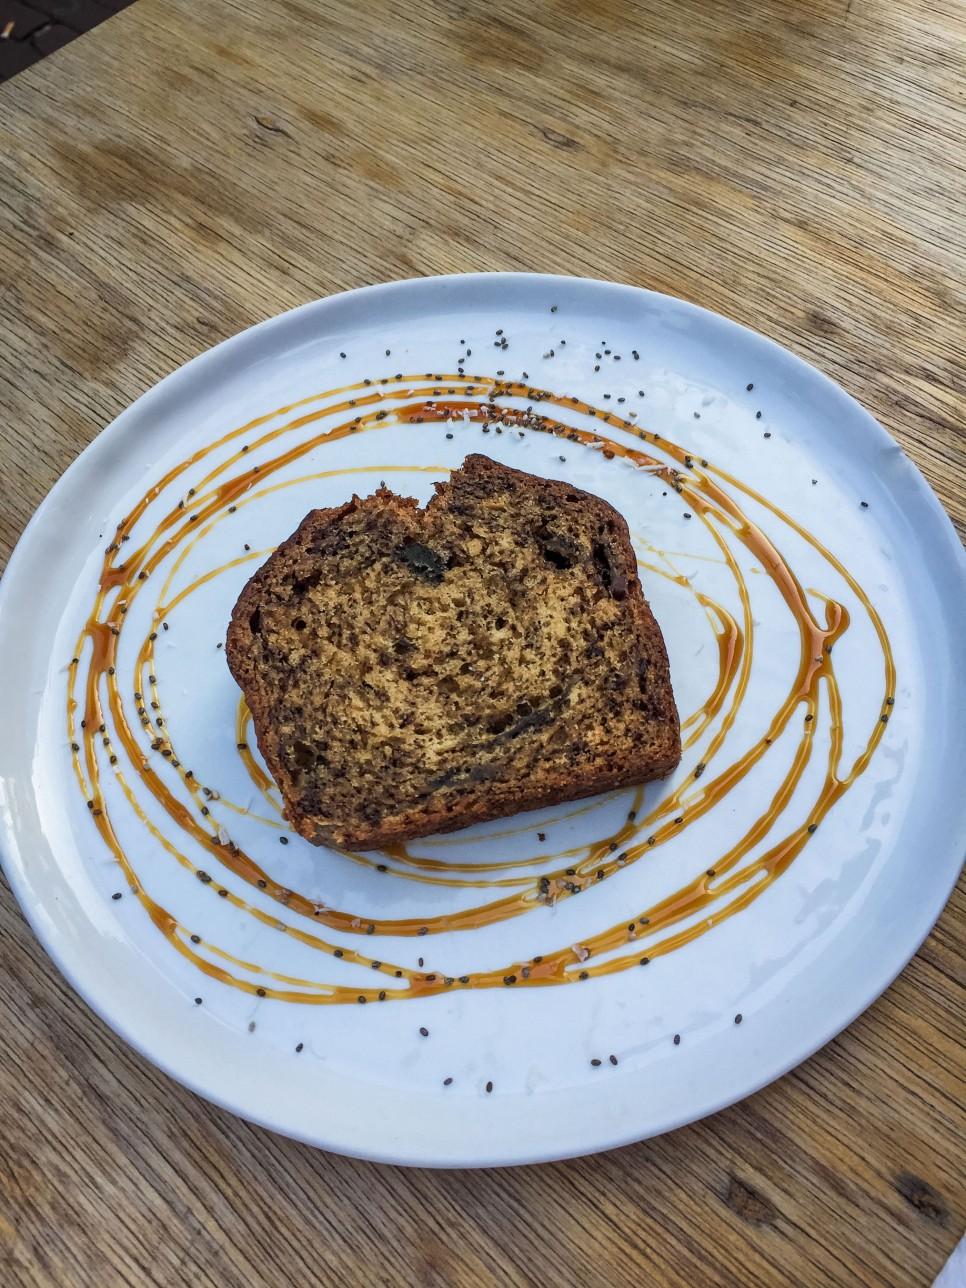 Amsterdam_food_cafe_banana bread